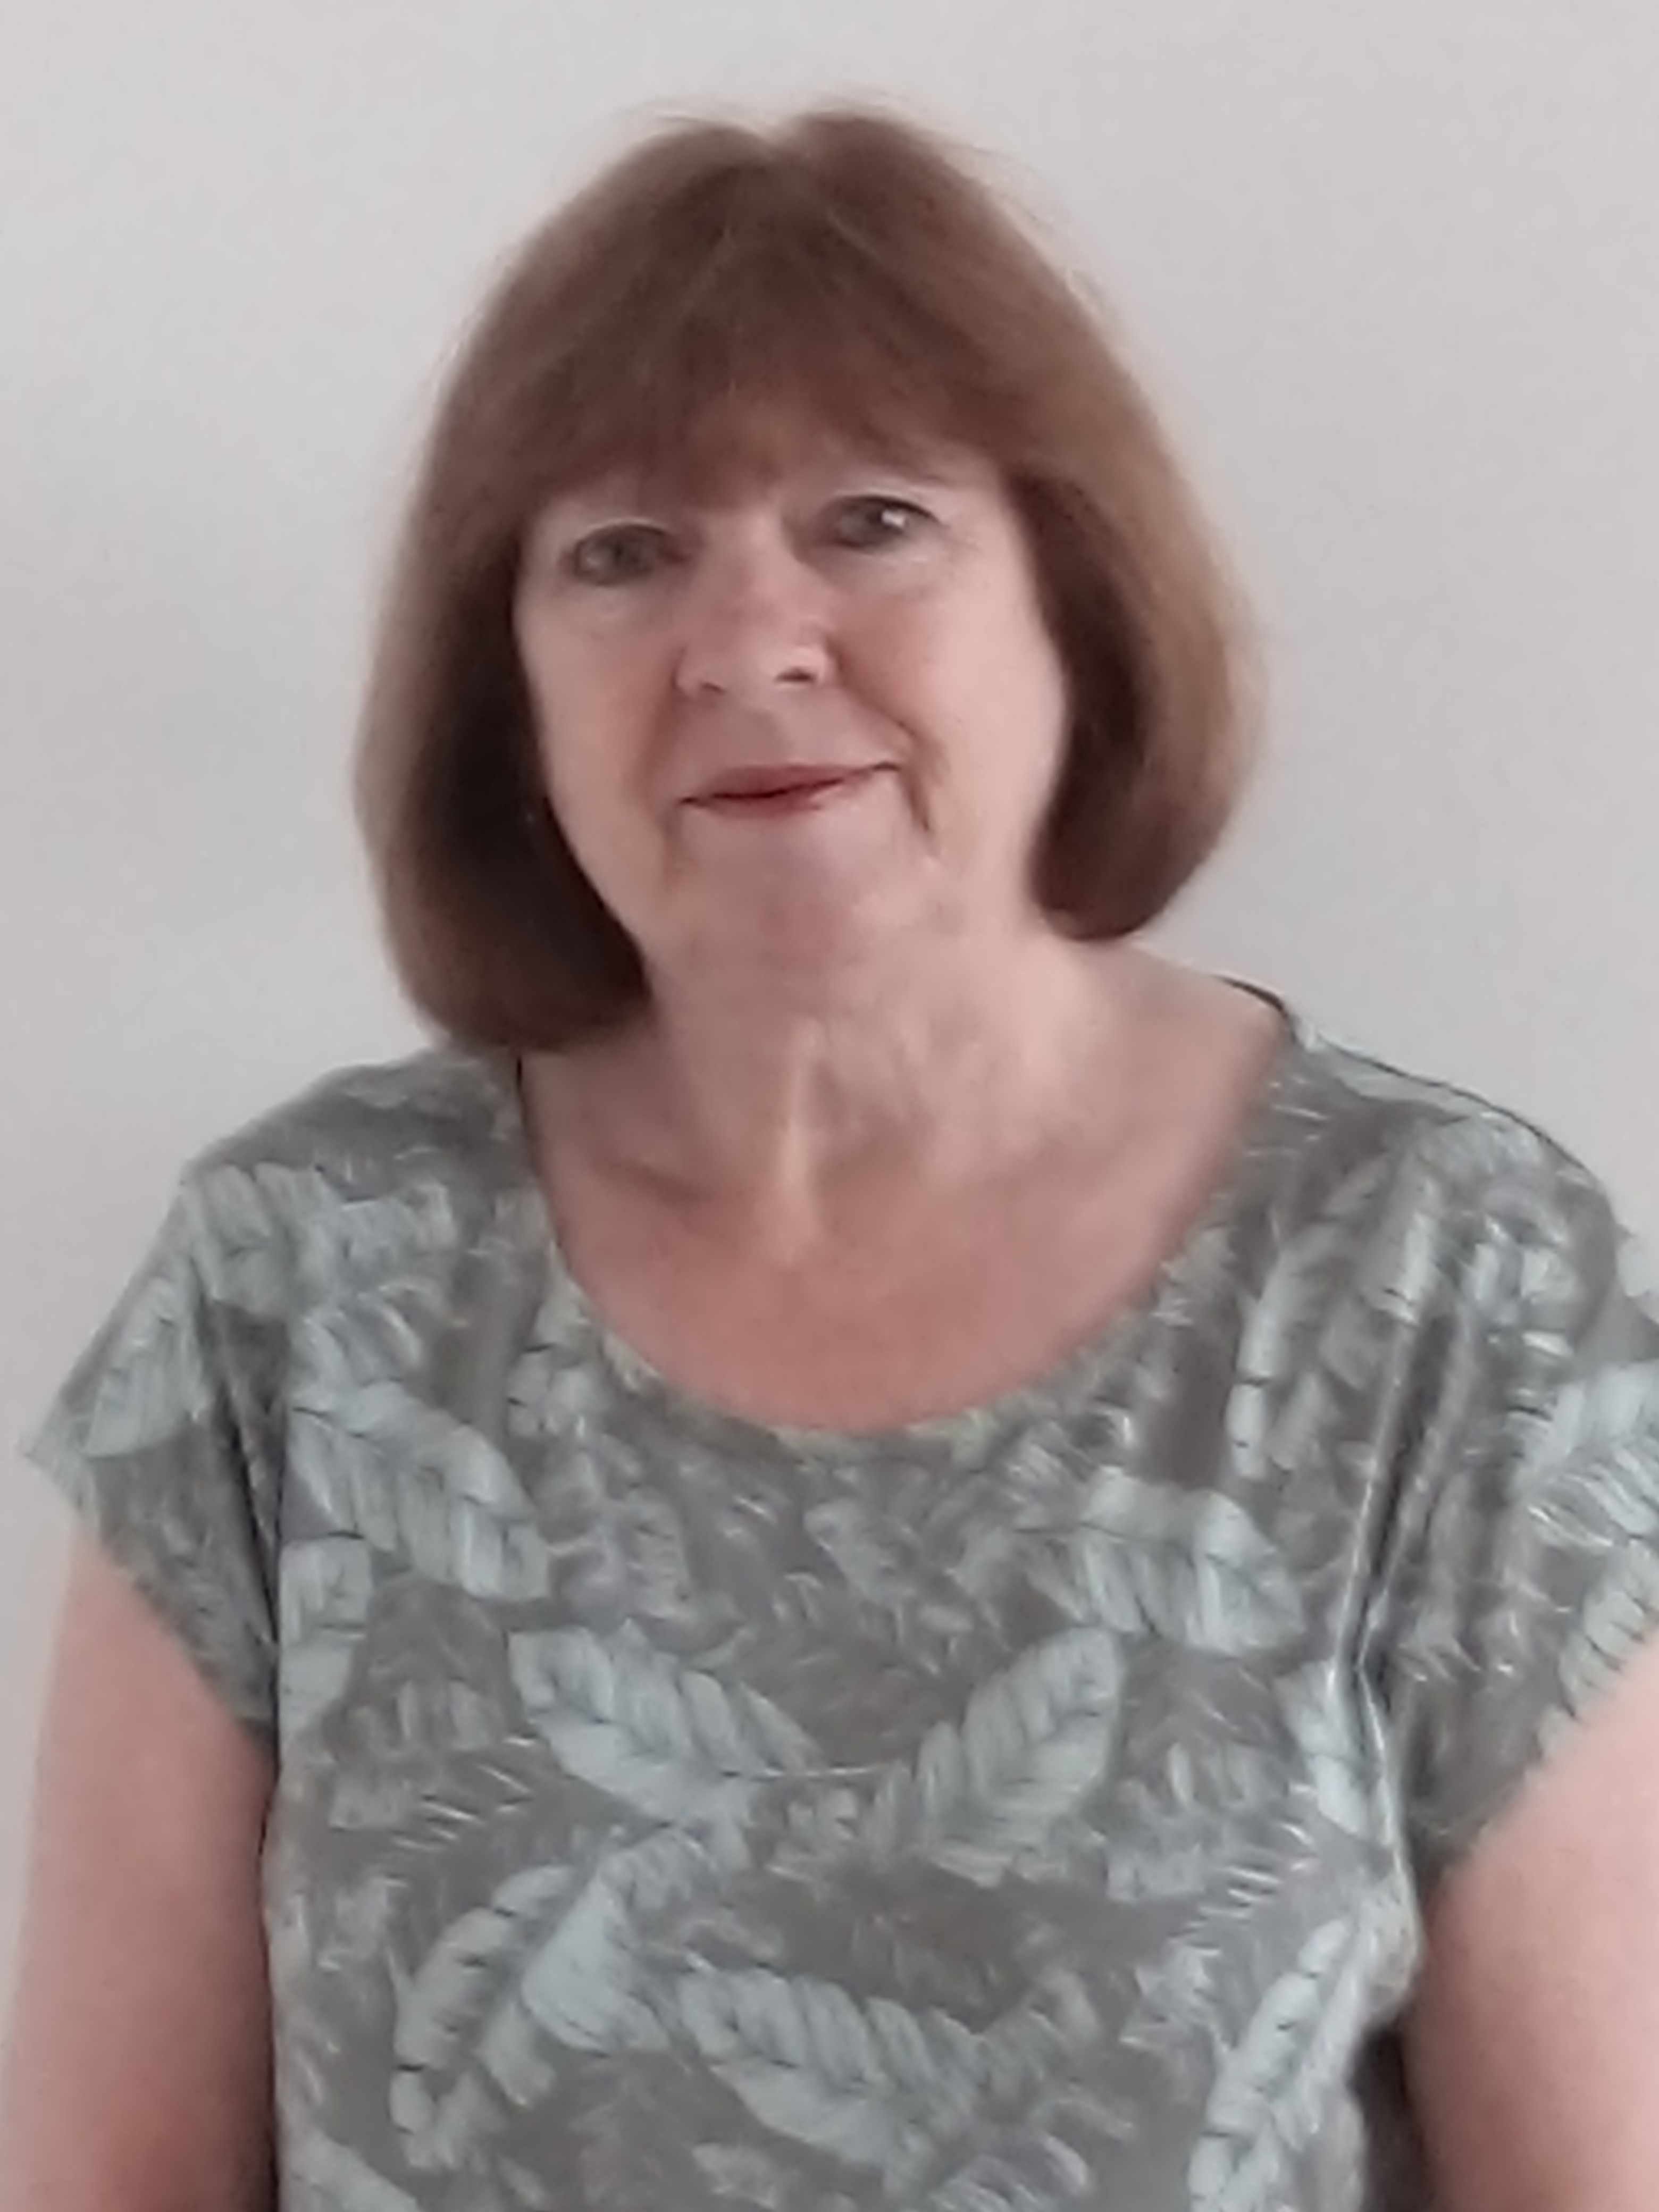 Pamela Fricker